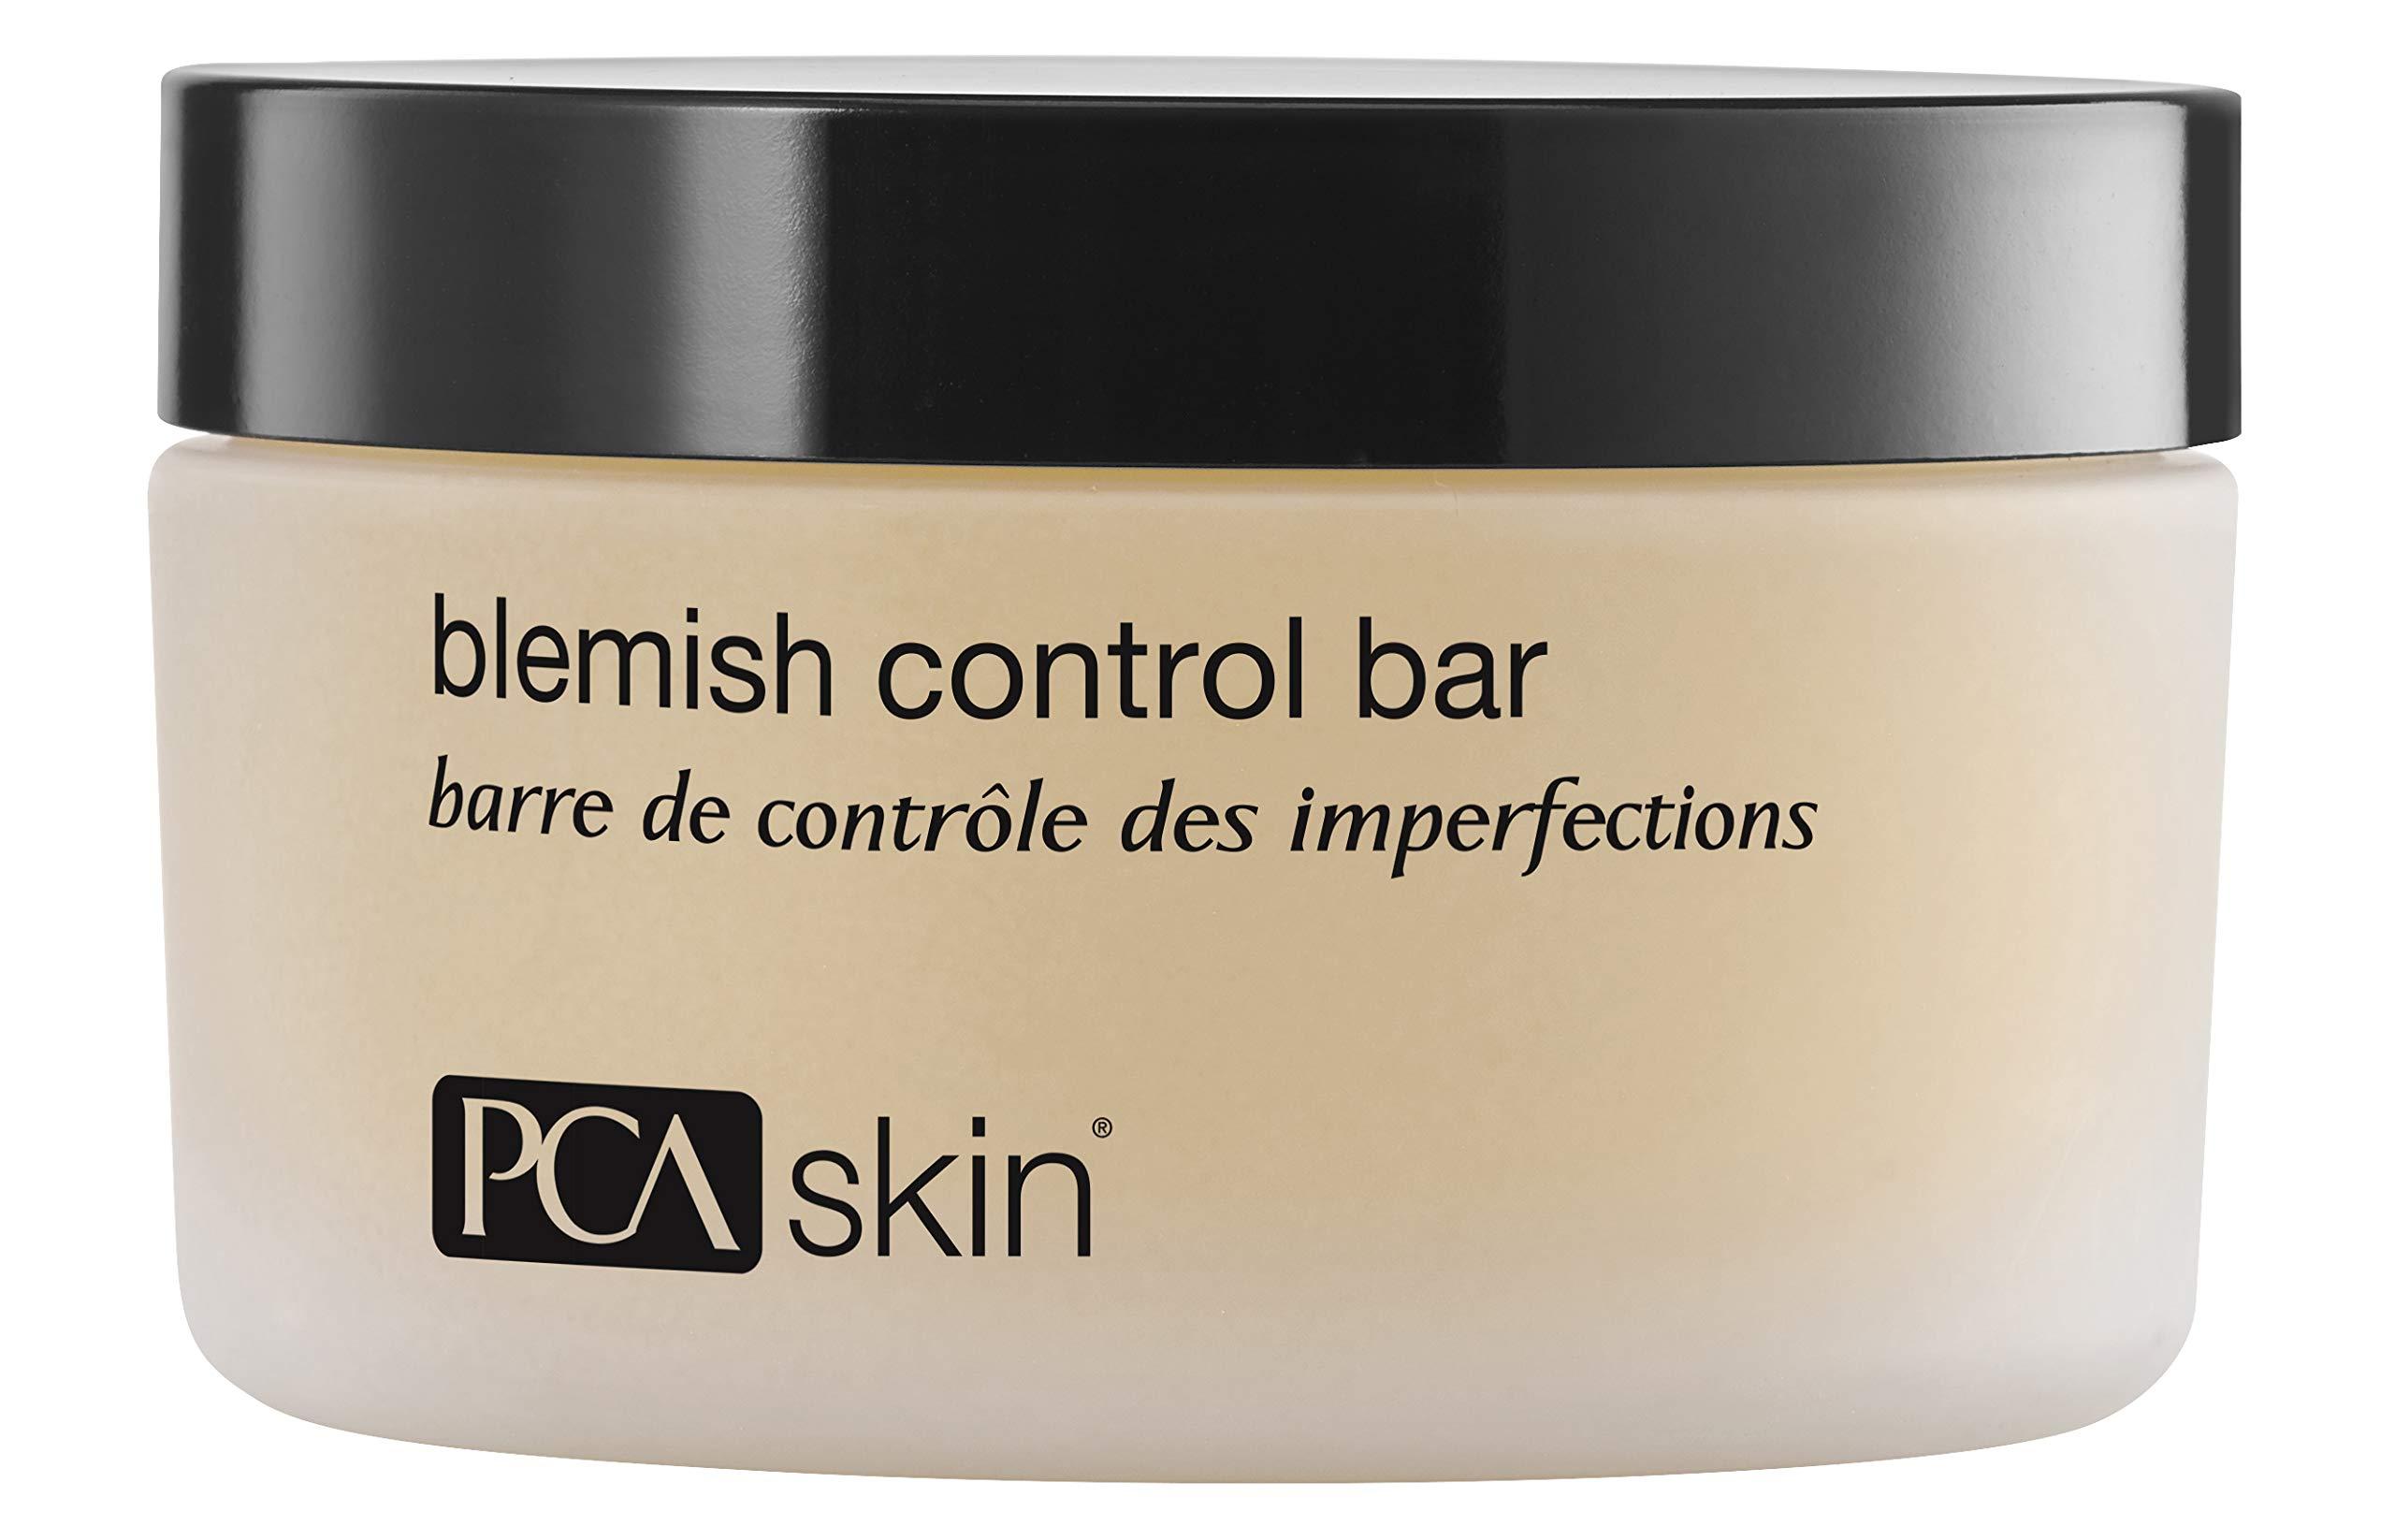 PCA SKIN Blemish Control Bar, 3.2 fl. oz.